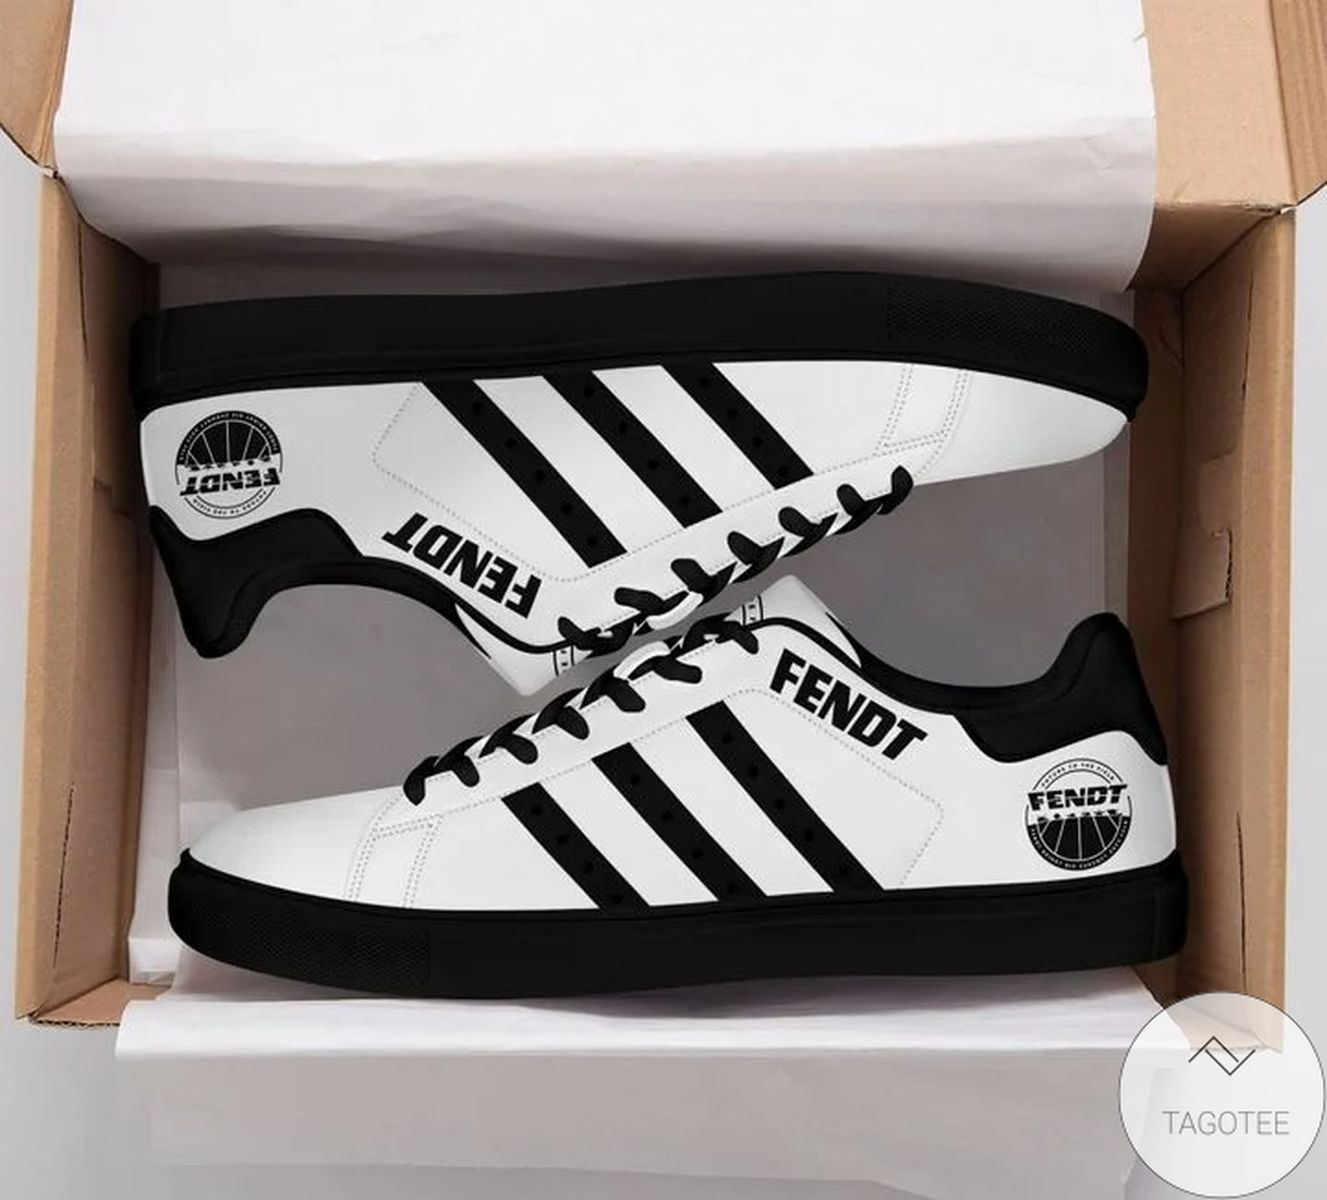 Free Fendt White Stan Smith Shoes